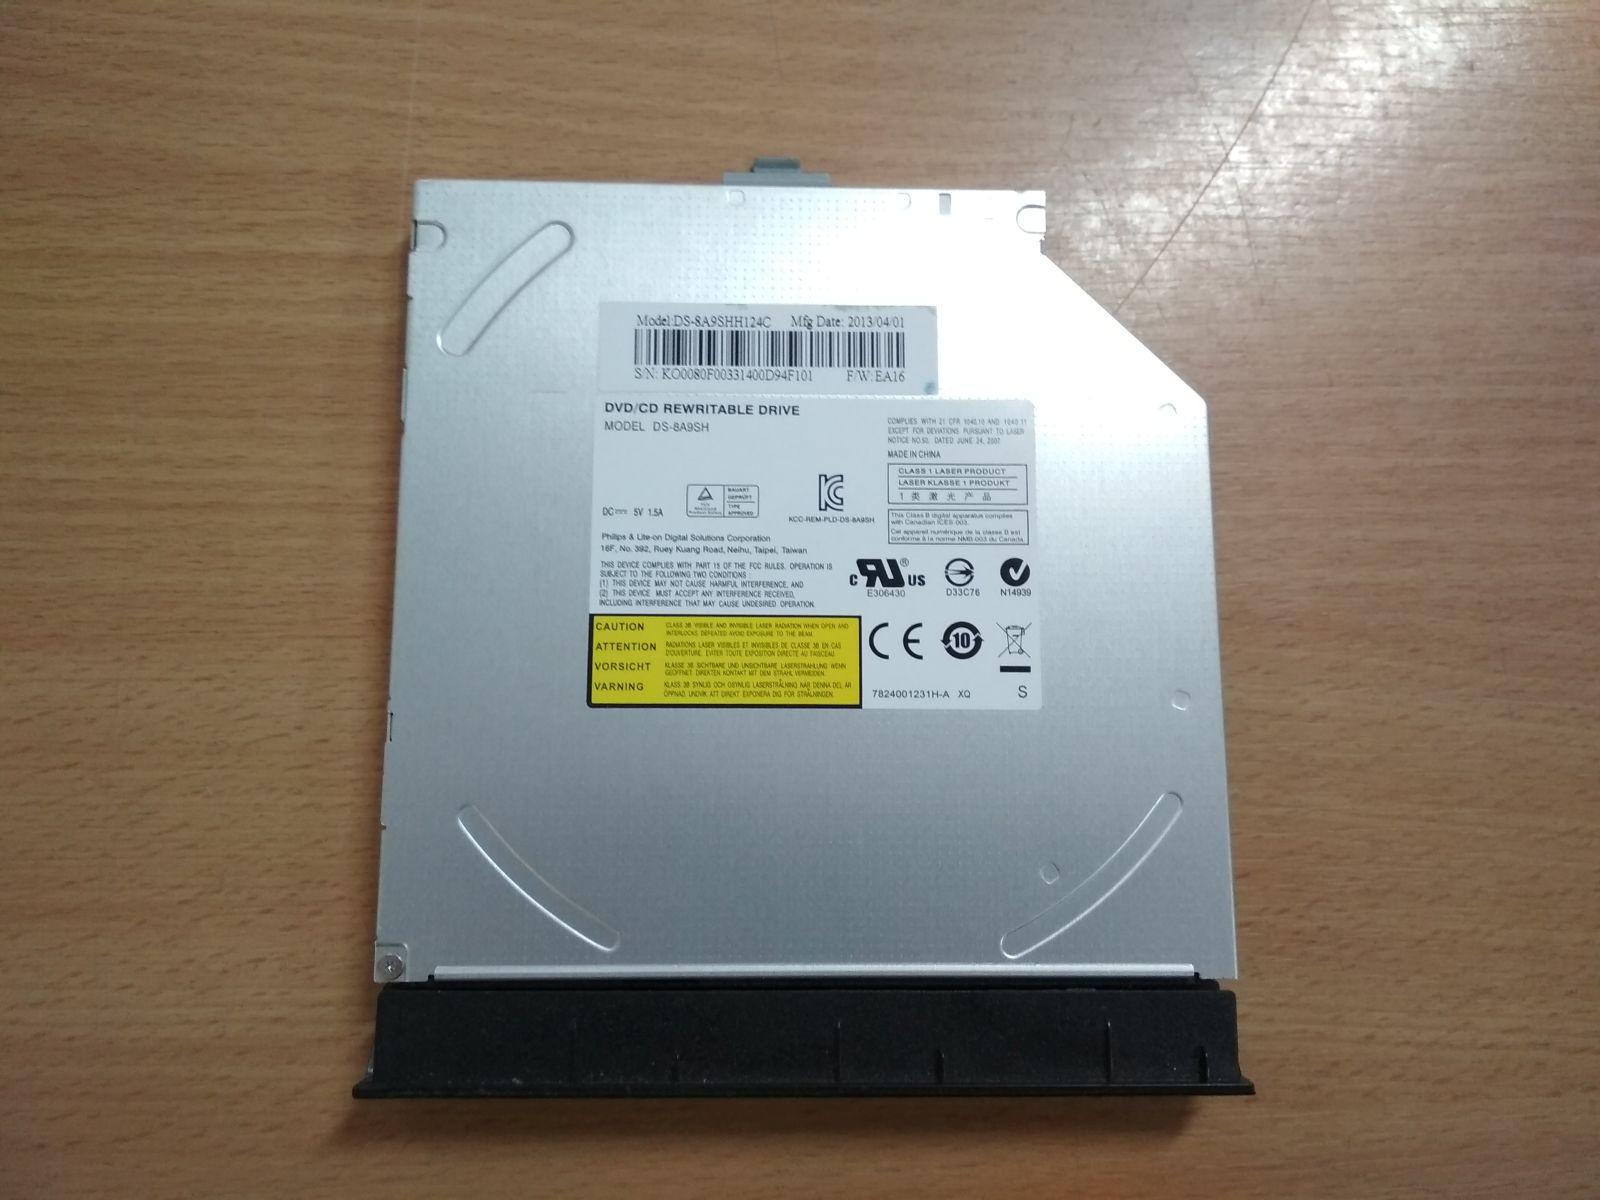 Acer V3-571 E1-571 E1-531 Packard Bell TE11HC Gateway NV56R ODD használt 1 hónap garancia!